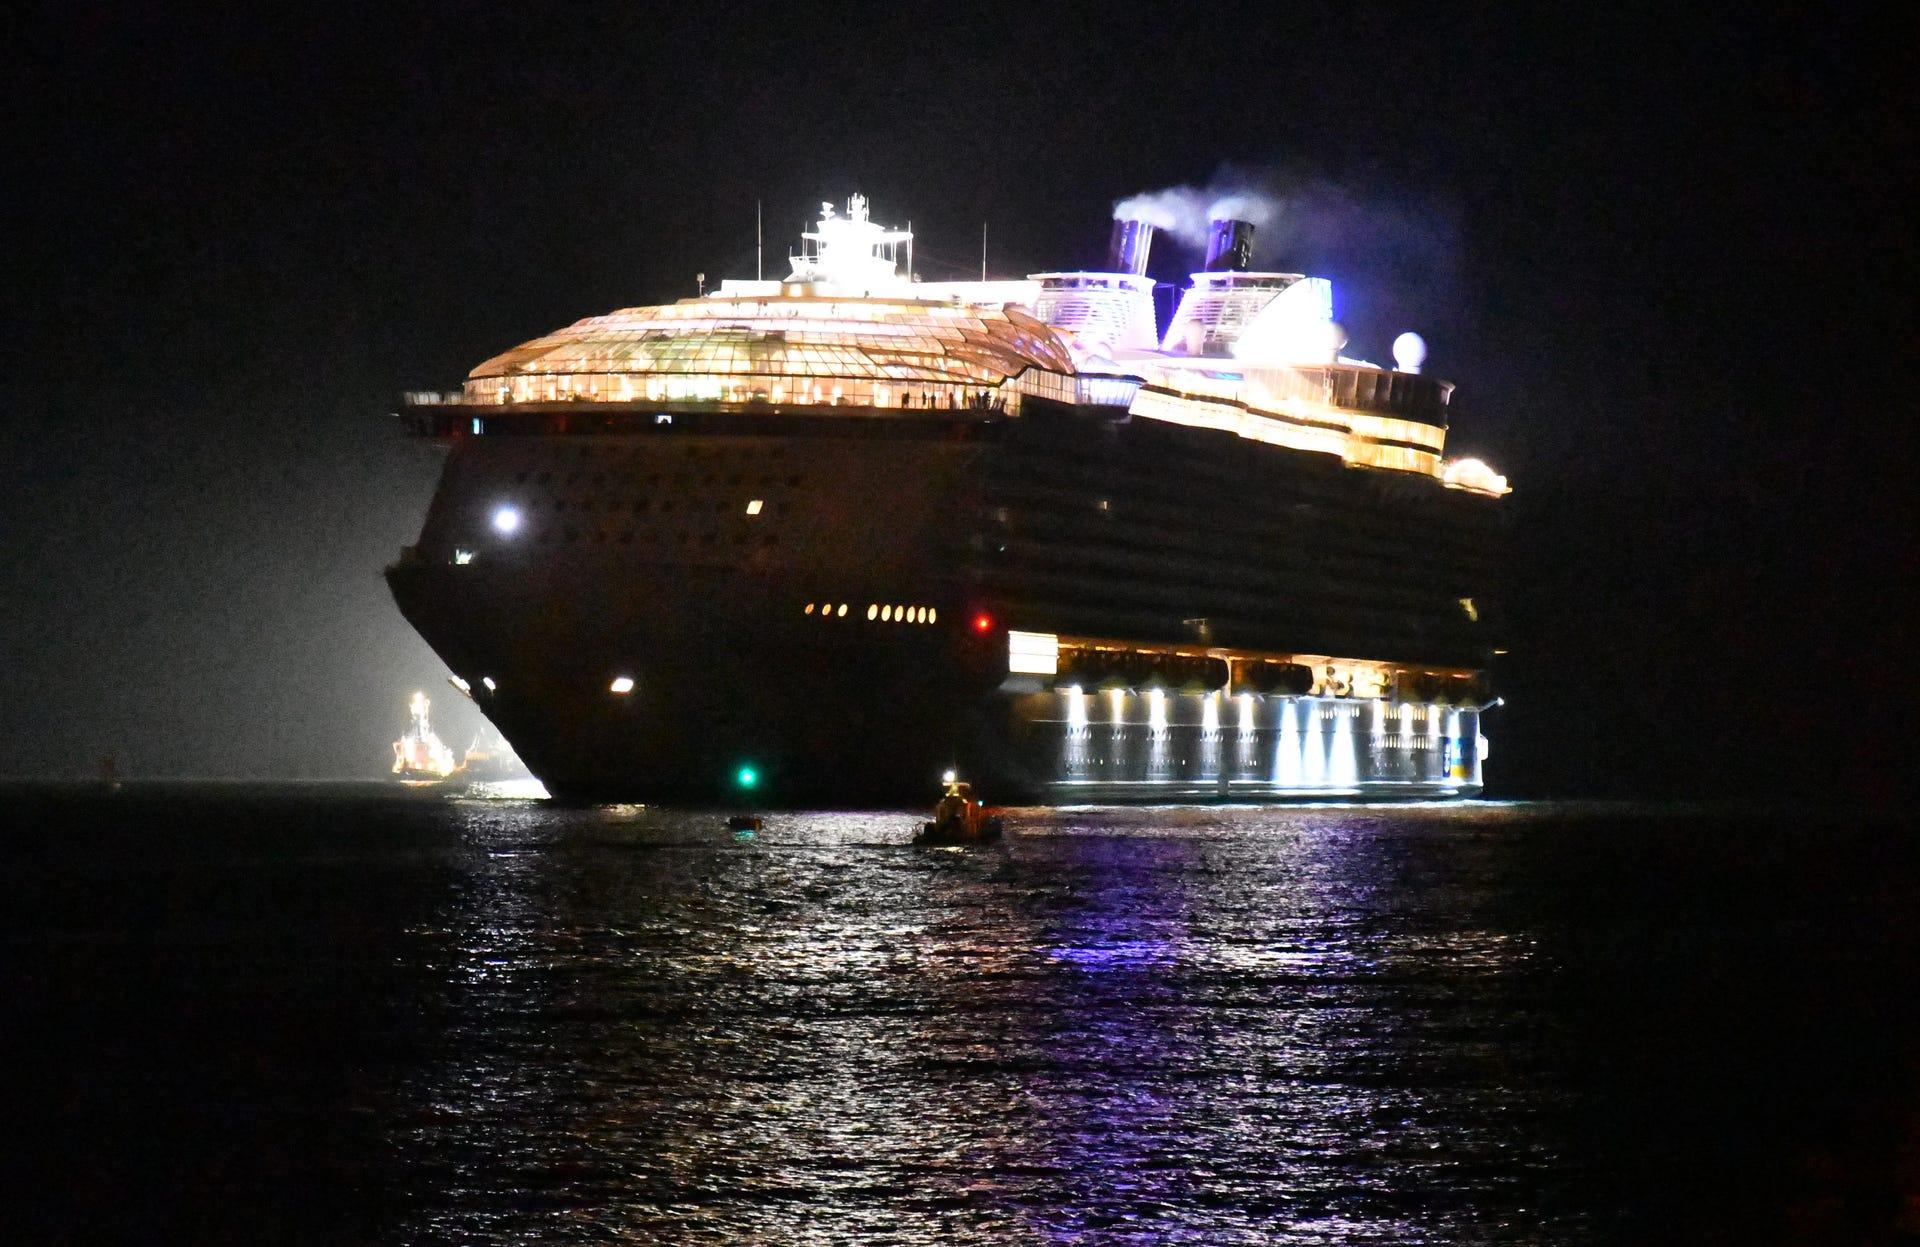 Symphony of the Seas: First photos as giant Royal Caribbean ship arrives